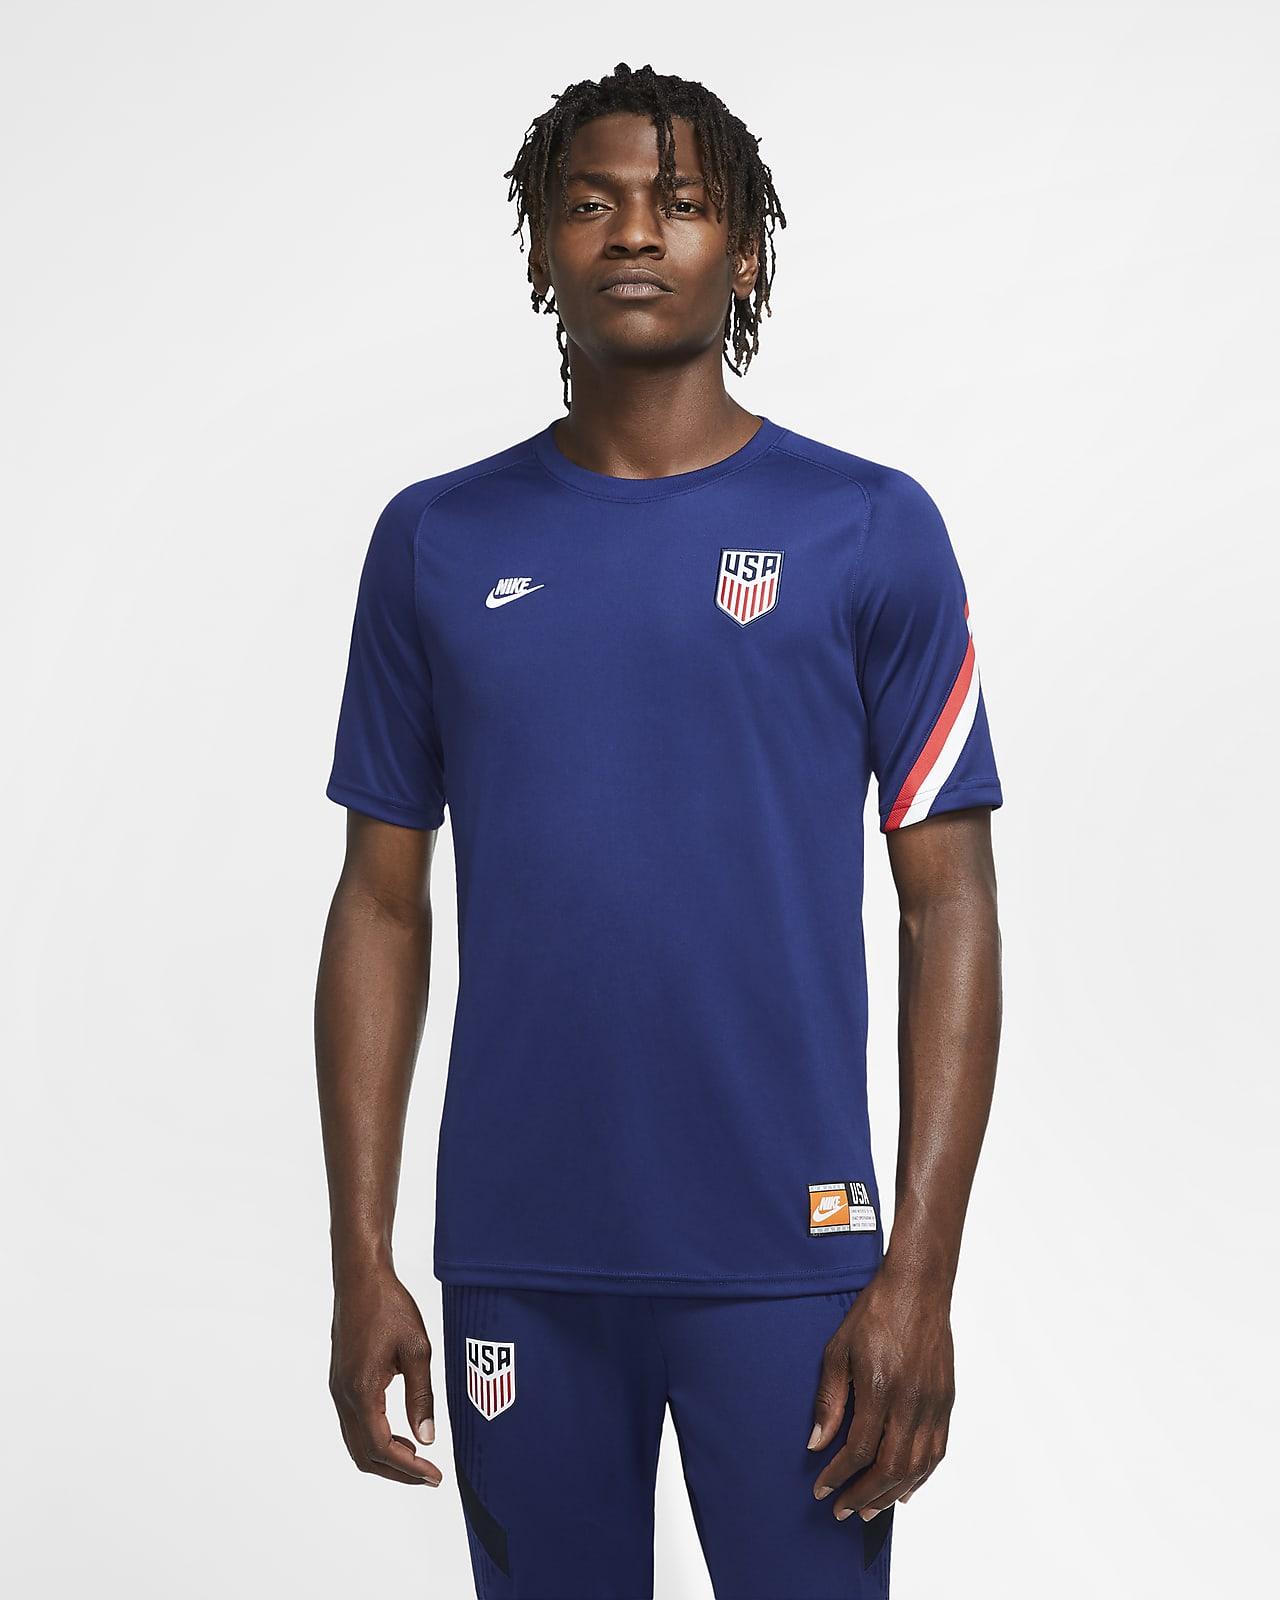 Stadium Top Nike Mens U.S